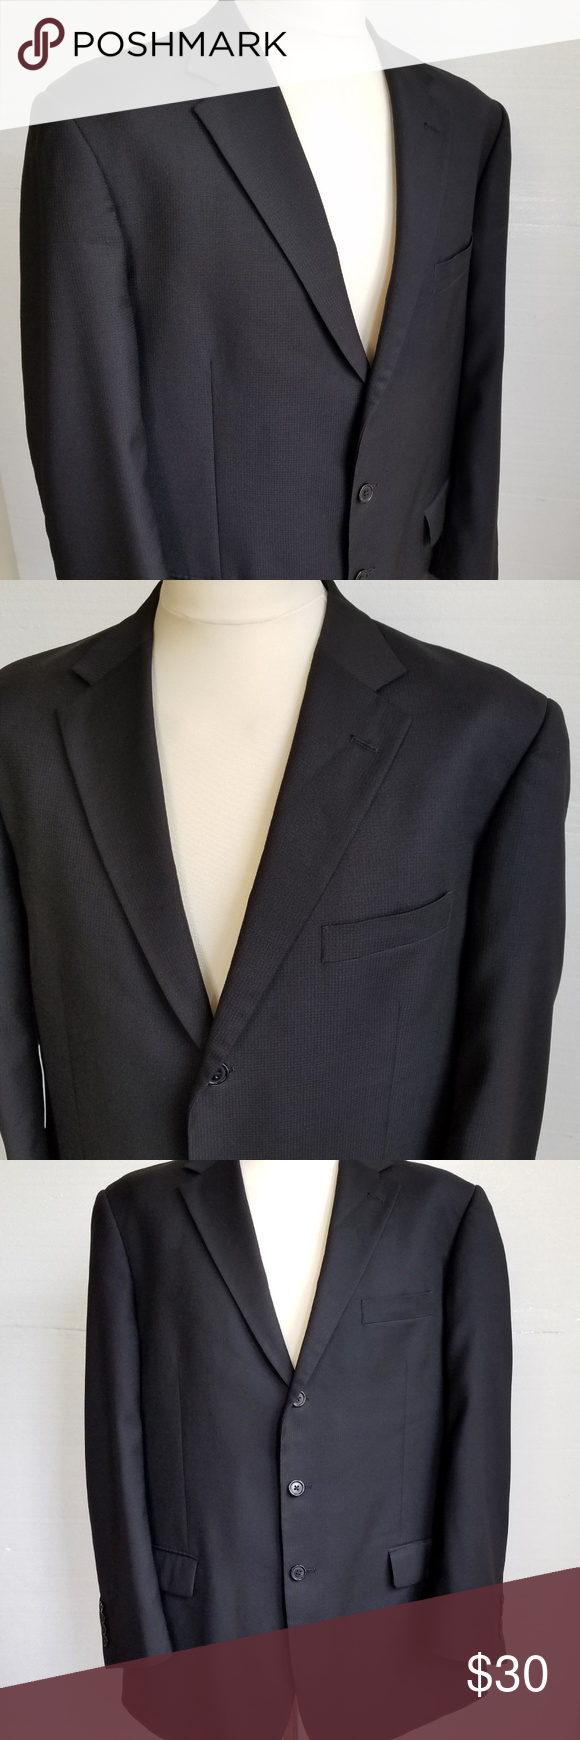 41d83ac387b Gianni Uomo Men s Black 3 Button Sport Coat Jacket Gianni Uomo Men s Black  3 Button Sport